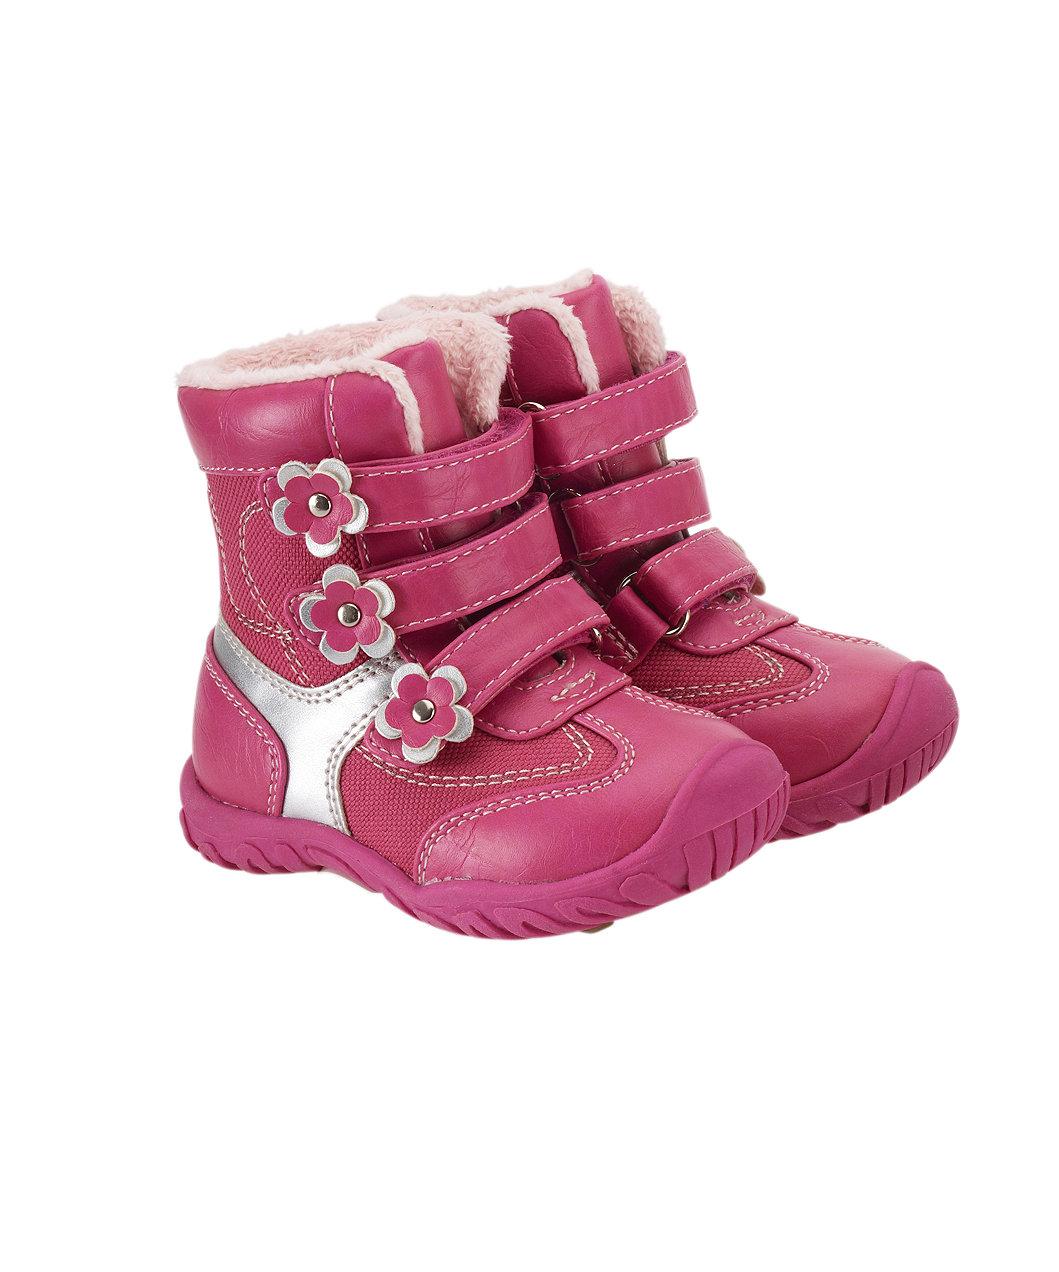 aa5f2b70ae4764 Зимові чобітки для дівчаток